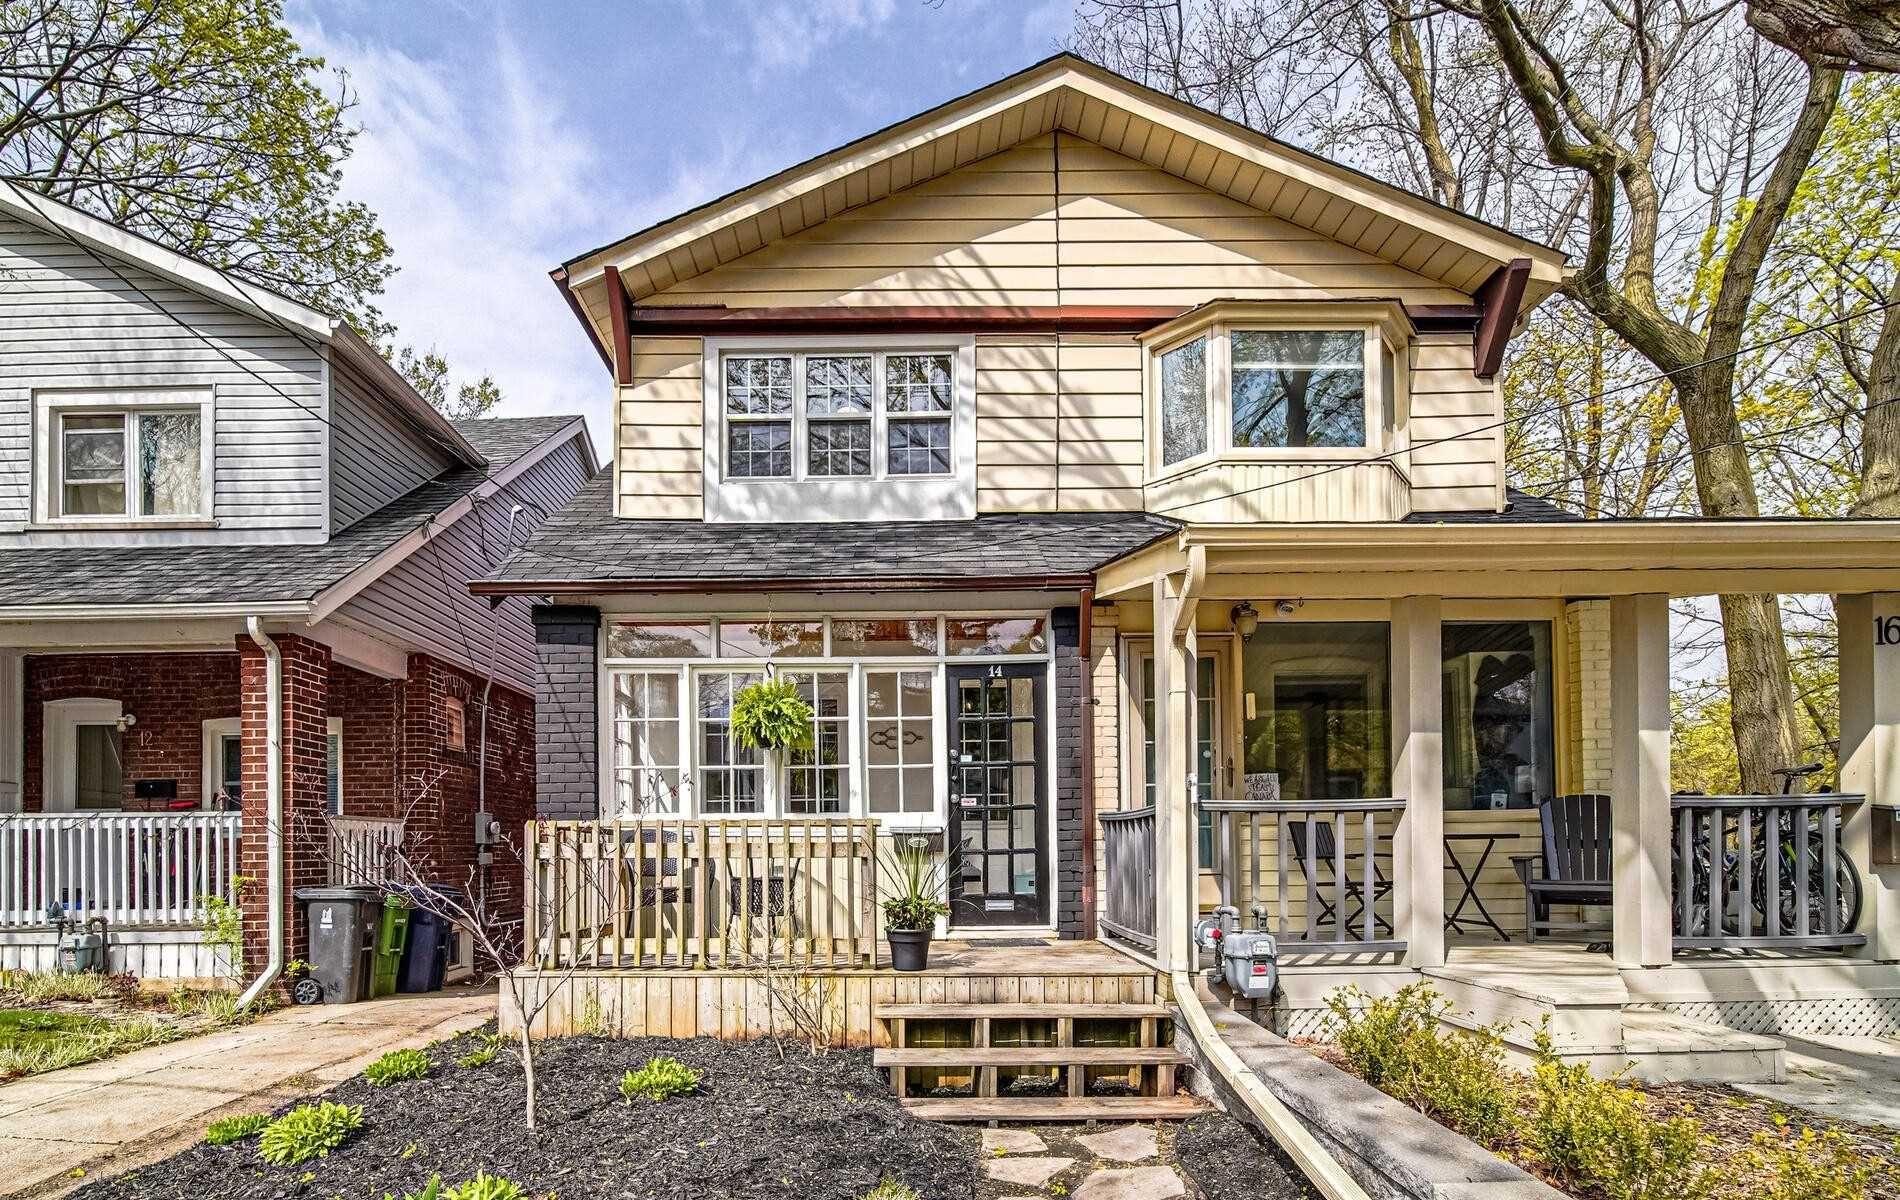 Main Photo: 14 Wildwood Crescent in Toronto: Woodbine Corridor House (2-Storey) for sale (Toronto E02)  : MLS®# E5219209